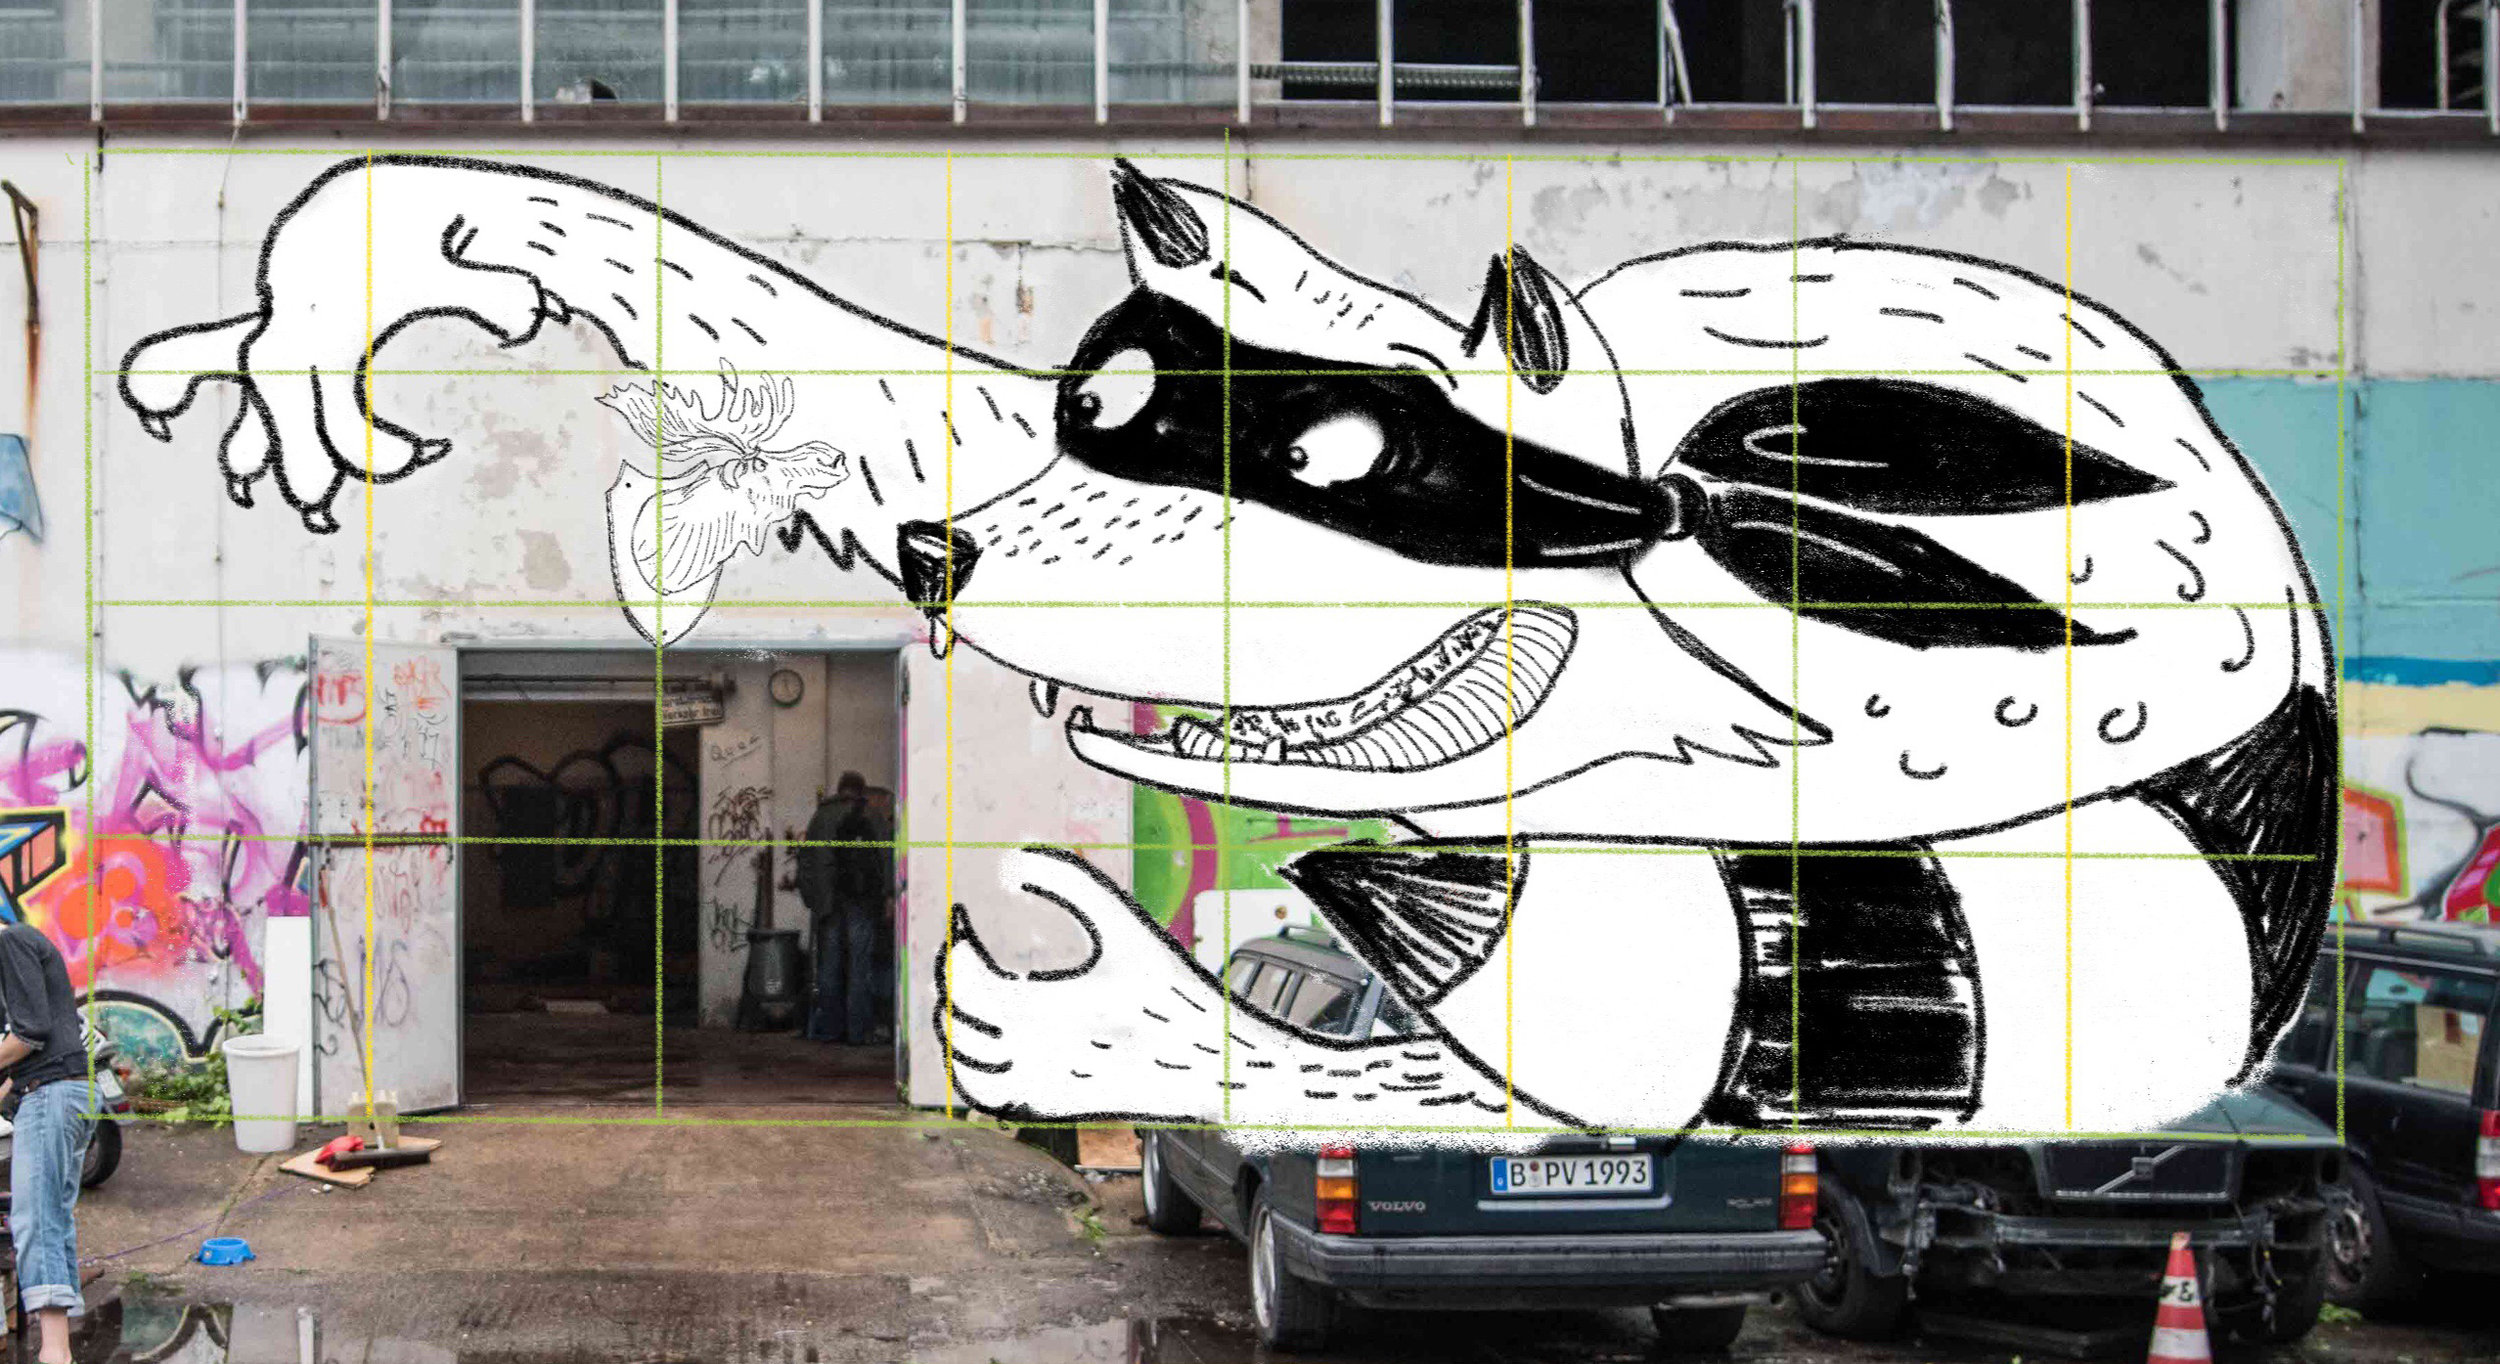 Mural_werkstatt-rhinstr-skizze03grid_PRINT.jpg